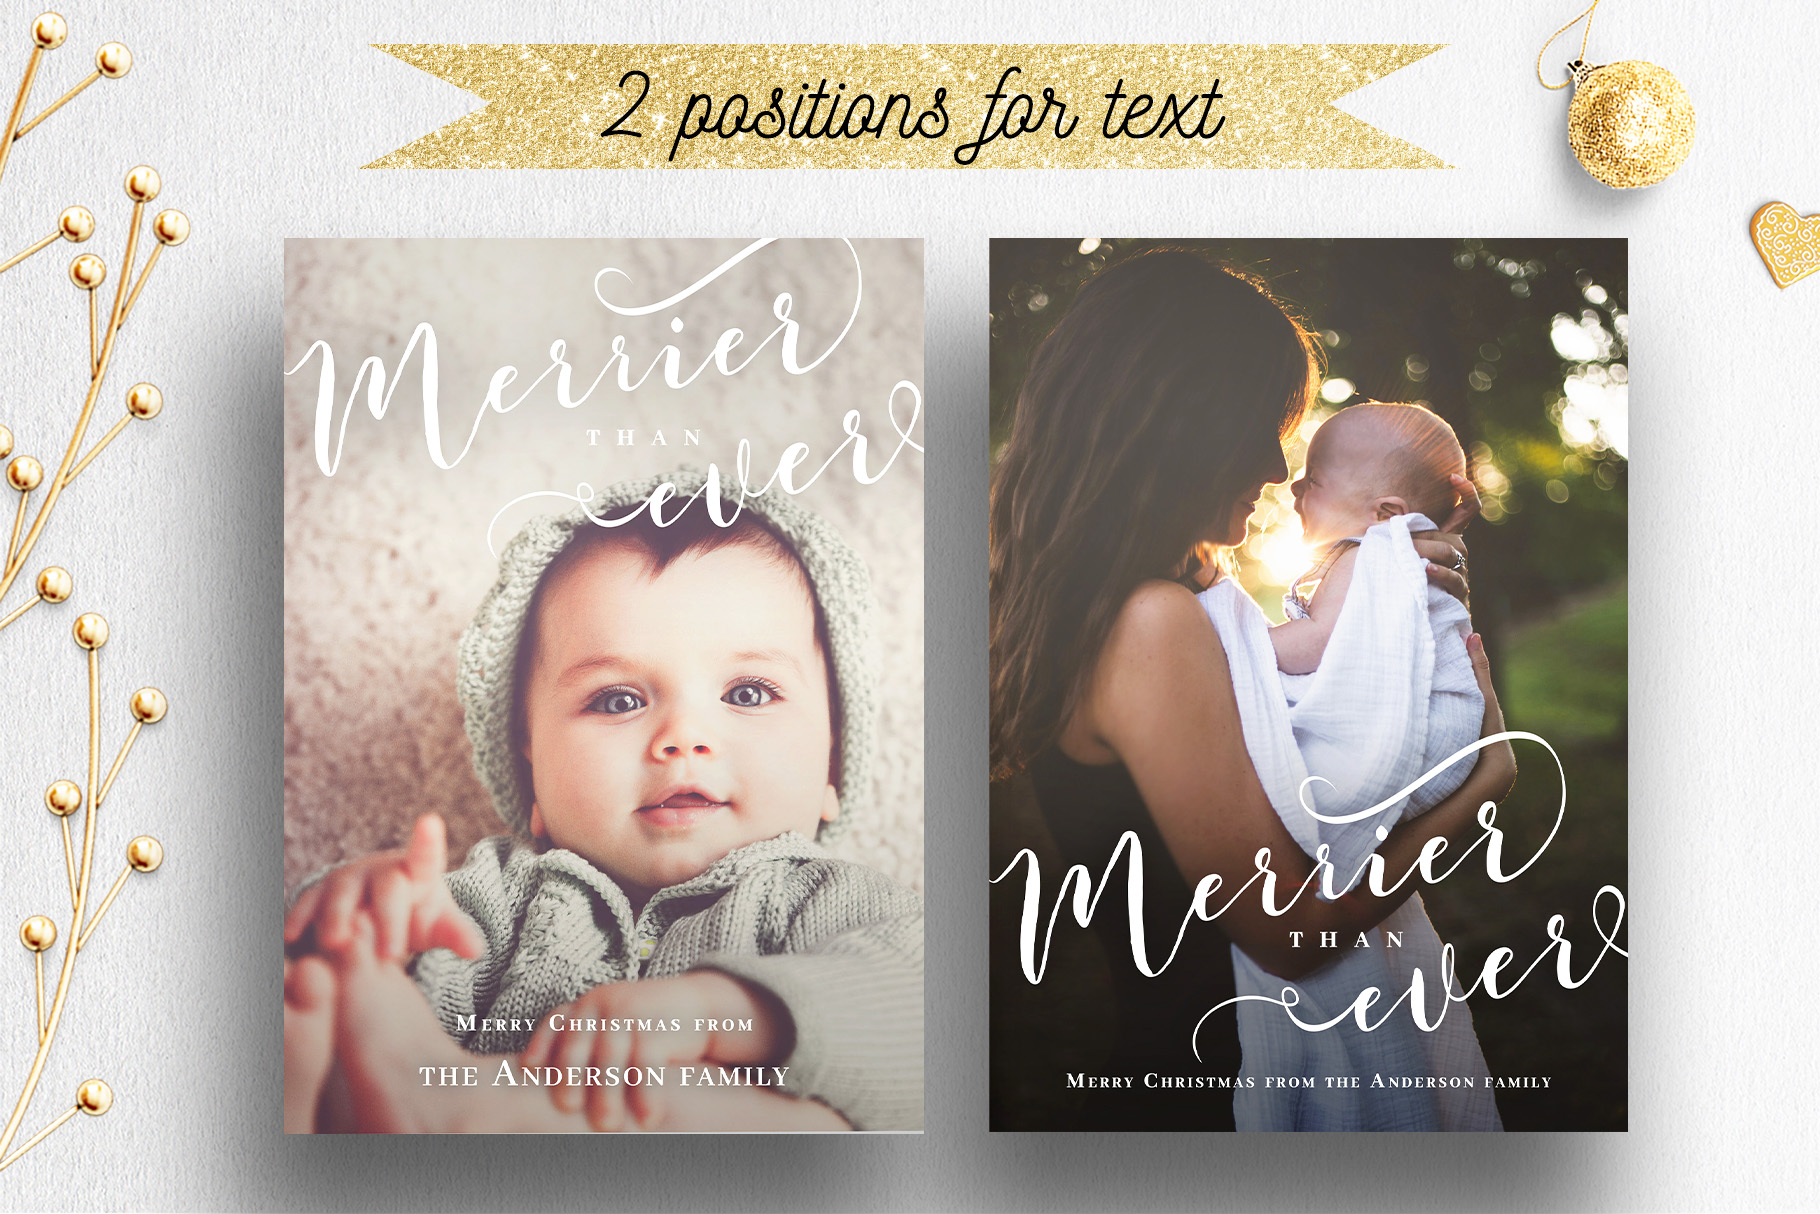 Newlywed Newborn Christmas Photo Card Template | 010